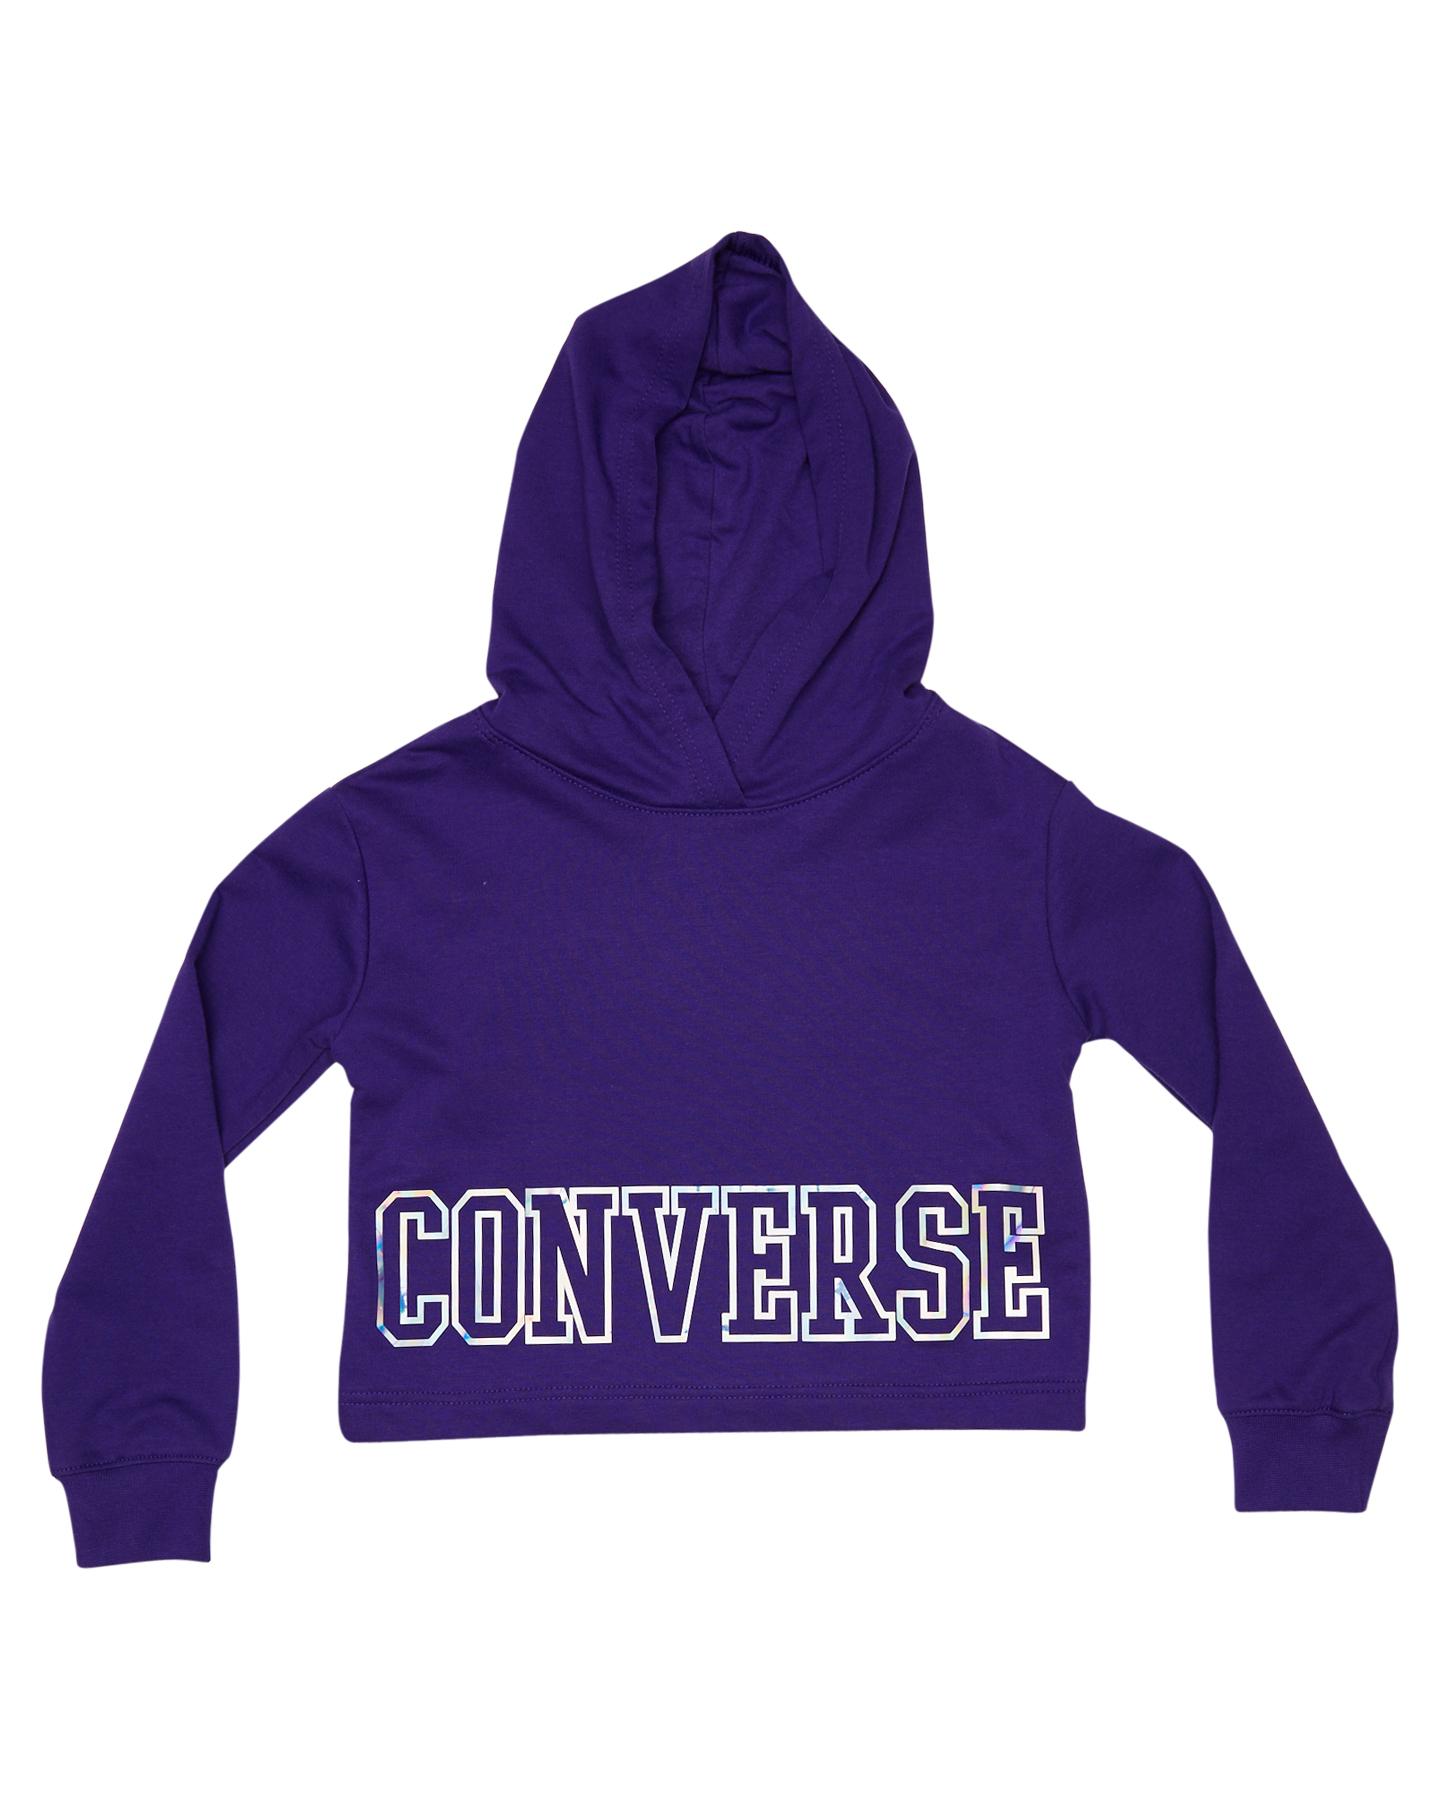 945268636281 Converse Girls Iridescent Hoodie - Kids - Court Purple